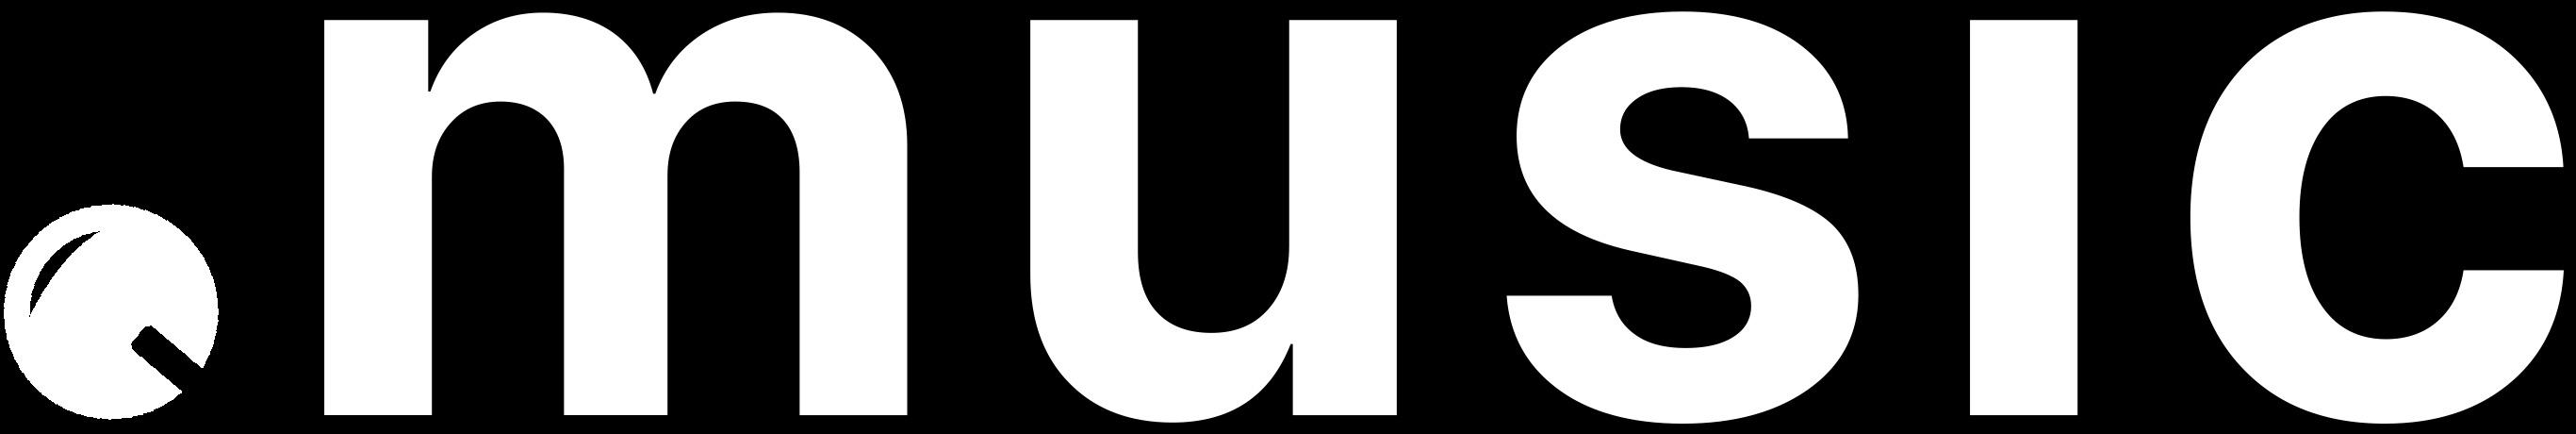 DotMusic-Logo-White-black-bg